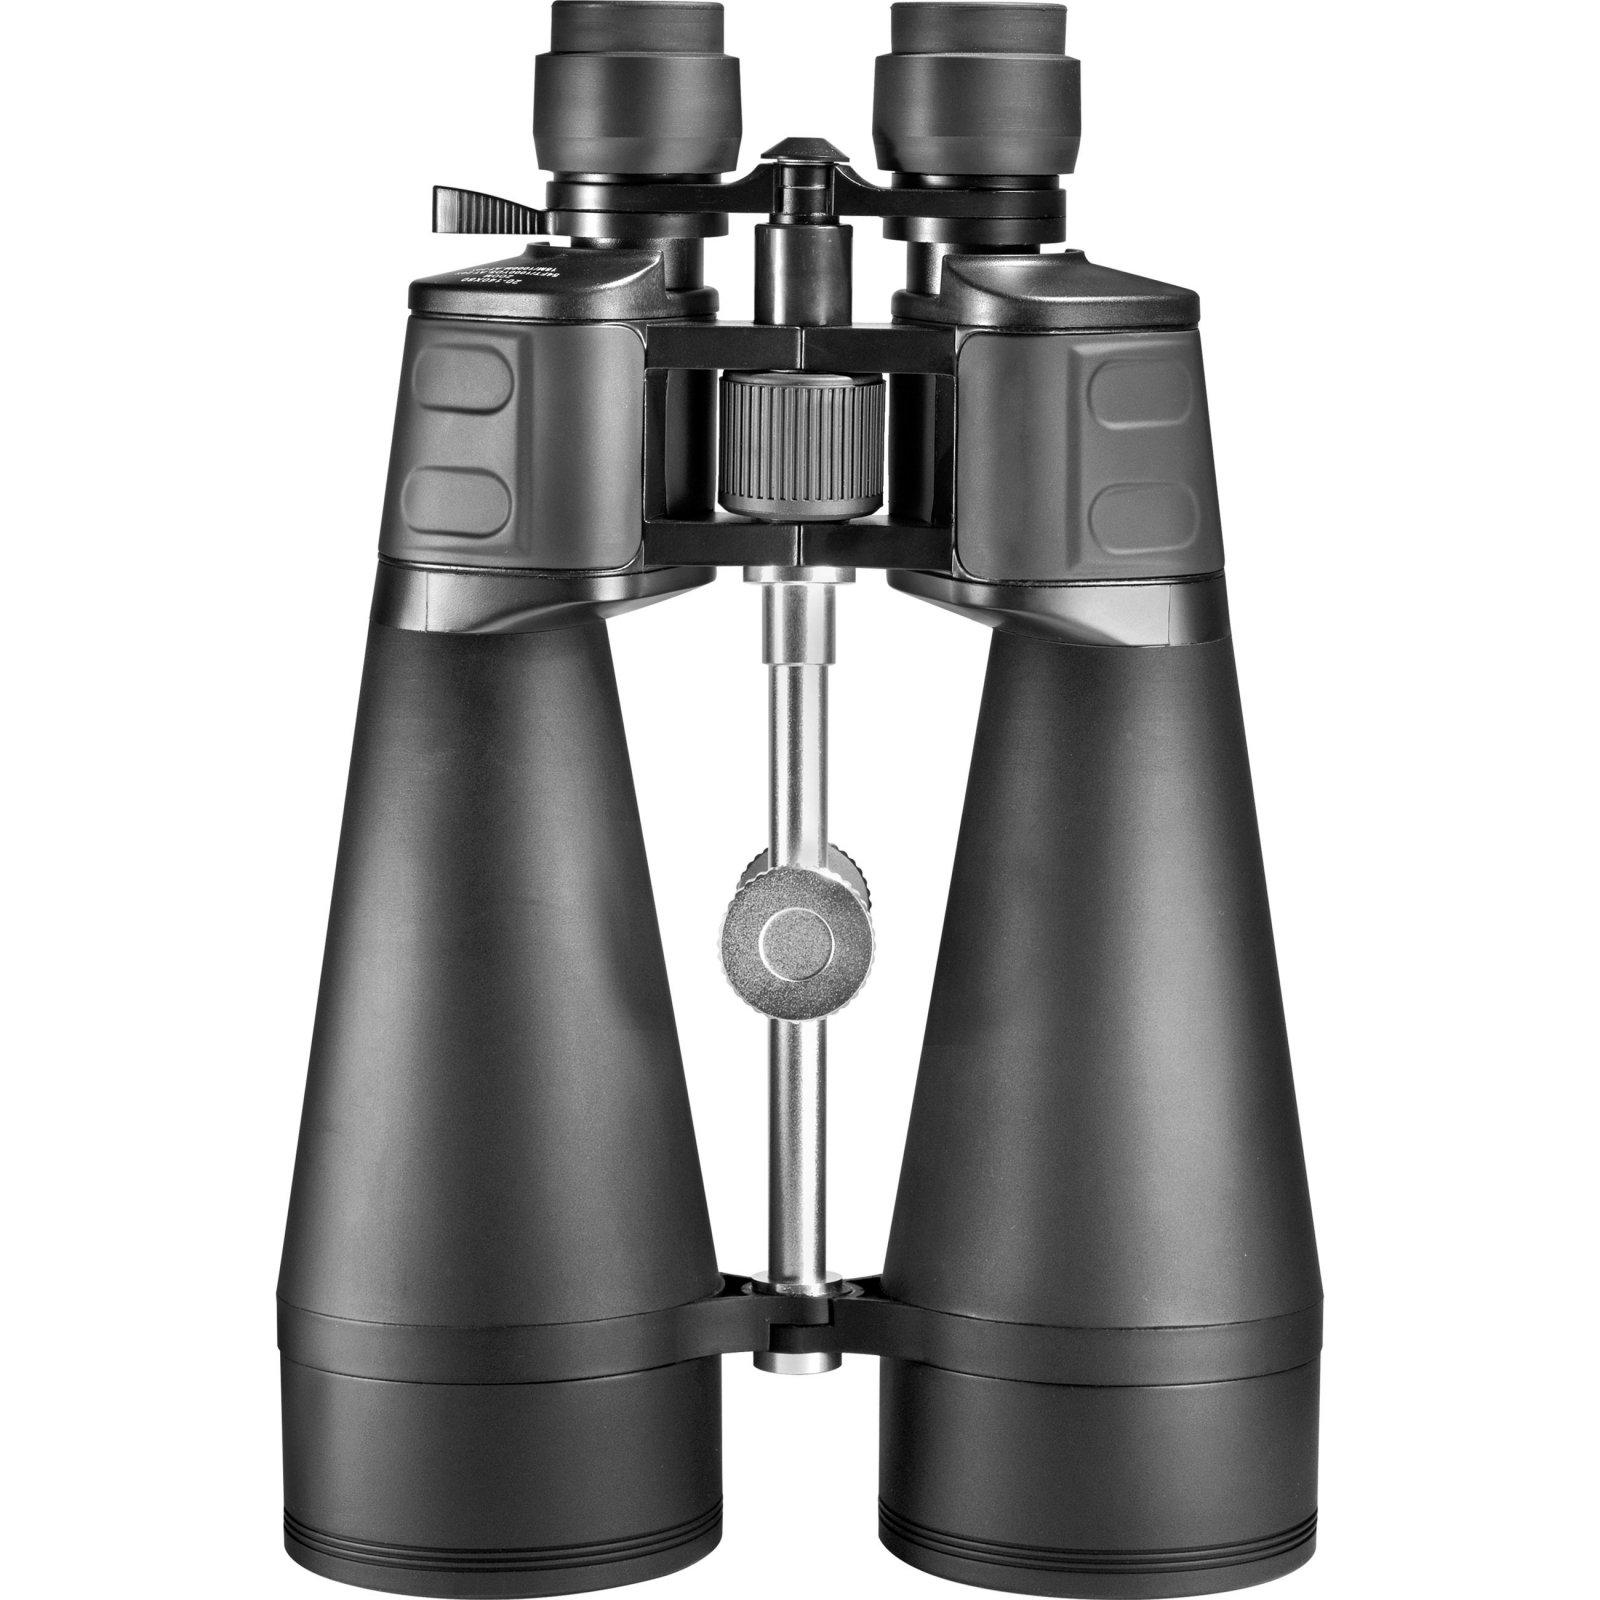 Barska 20-140x80mm Gladiator Zoom Binoculars